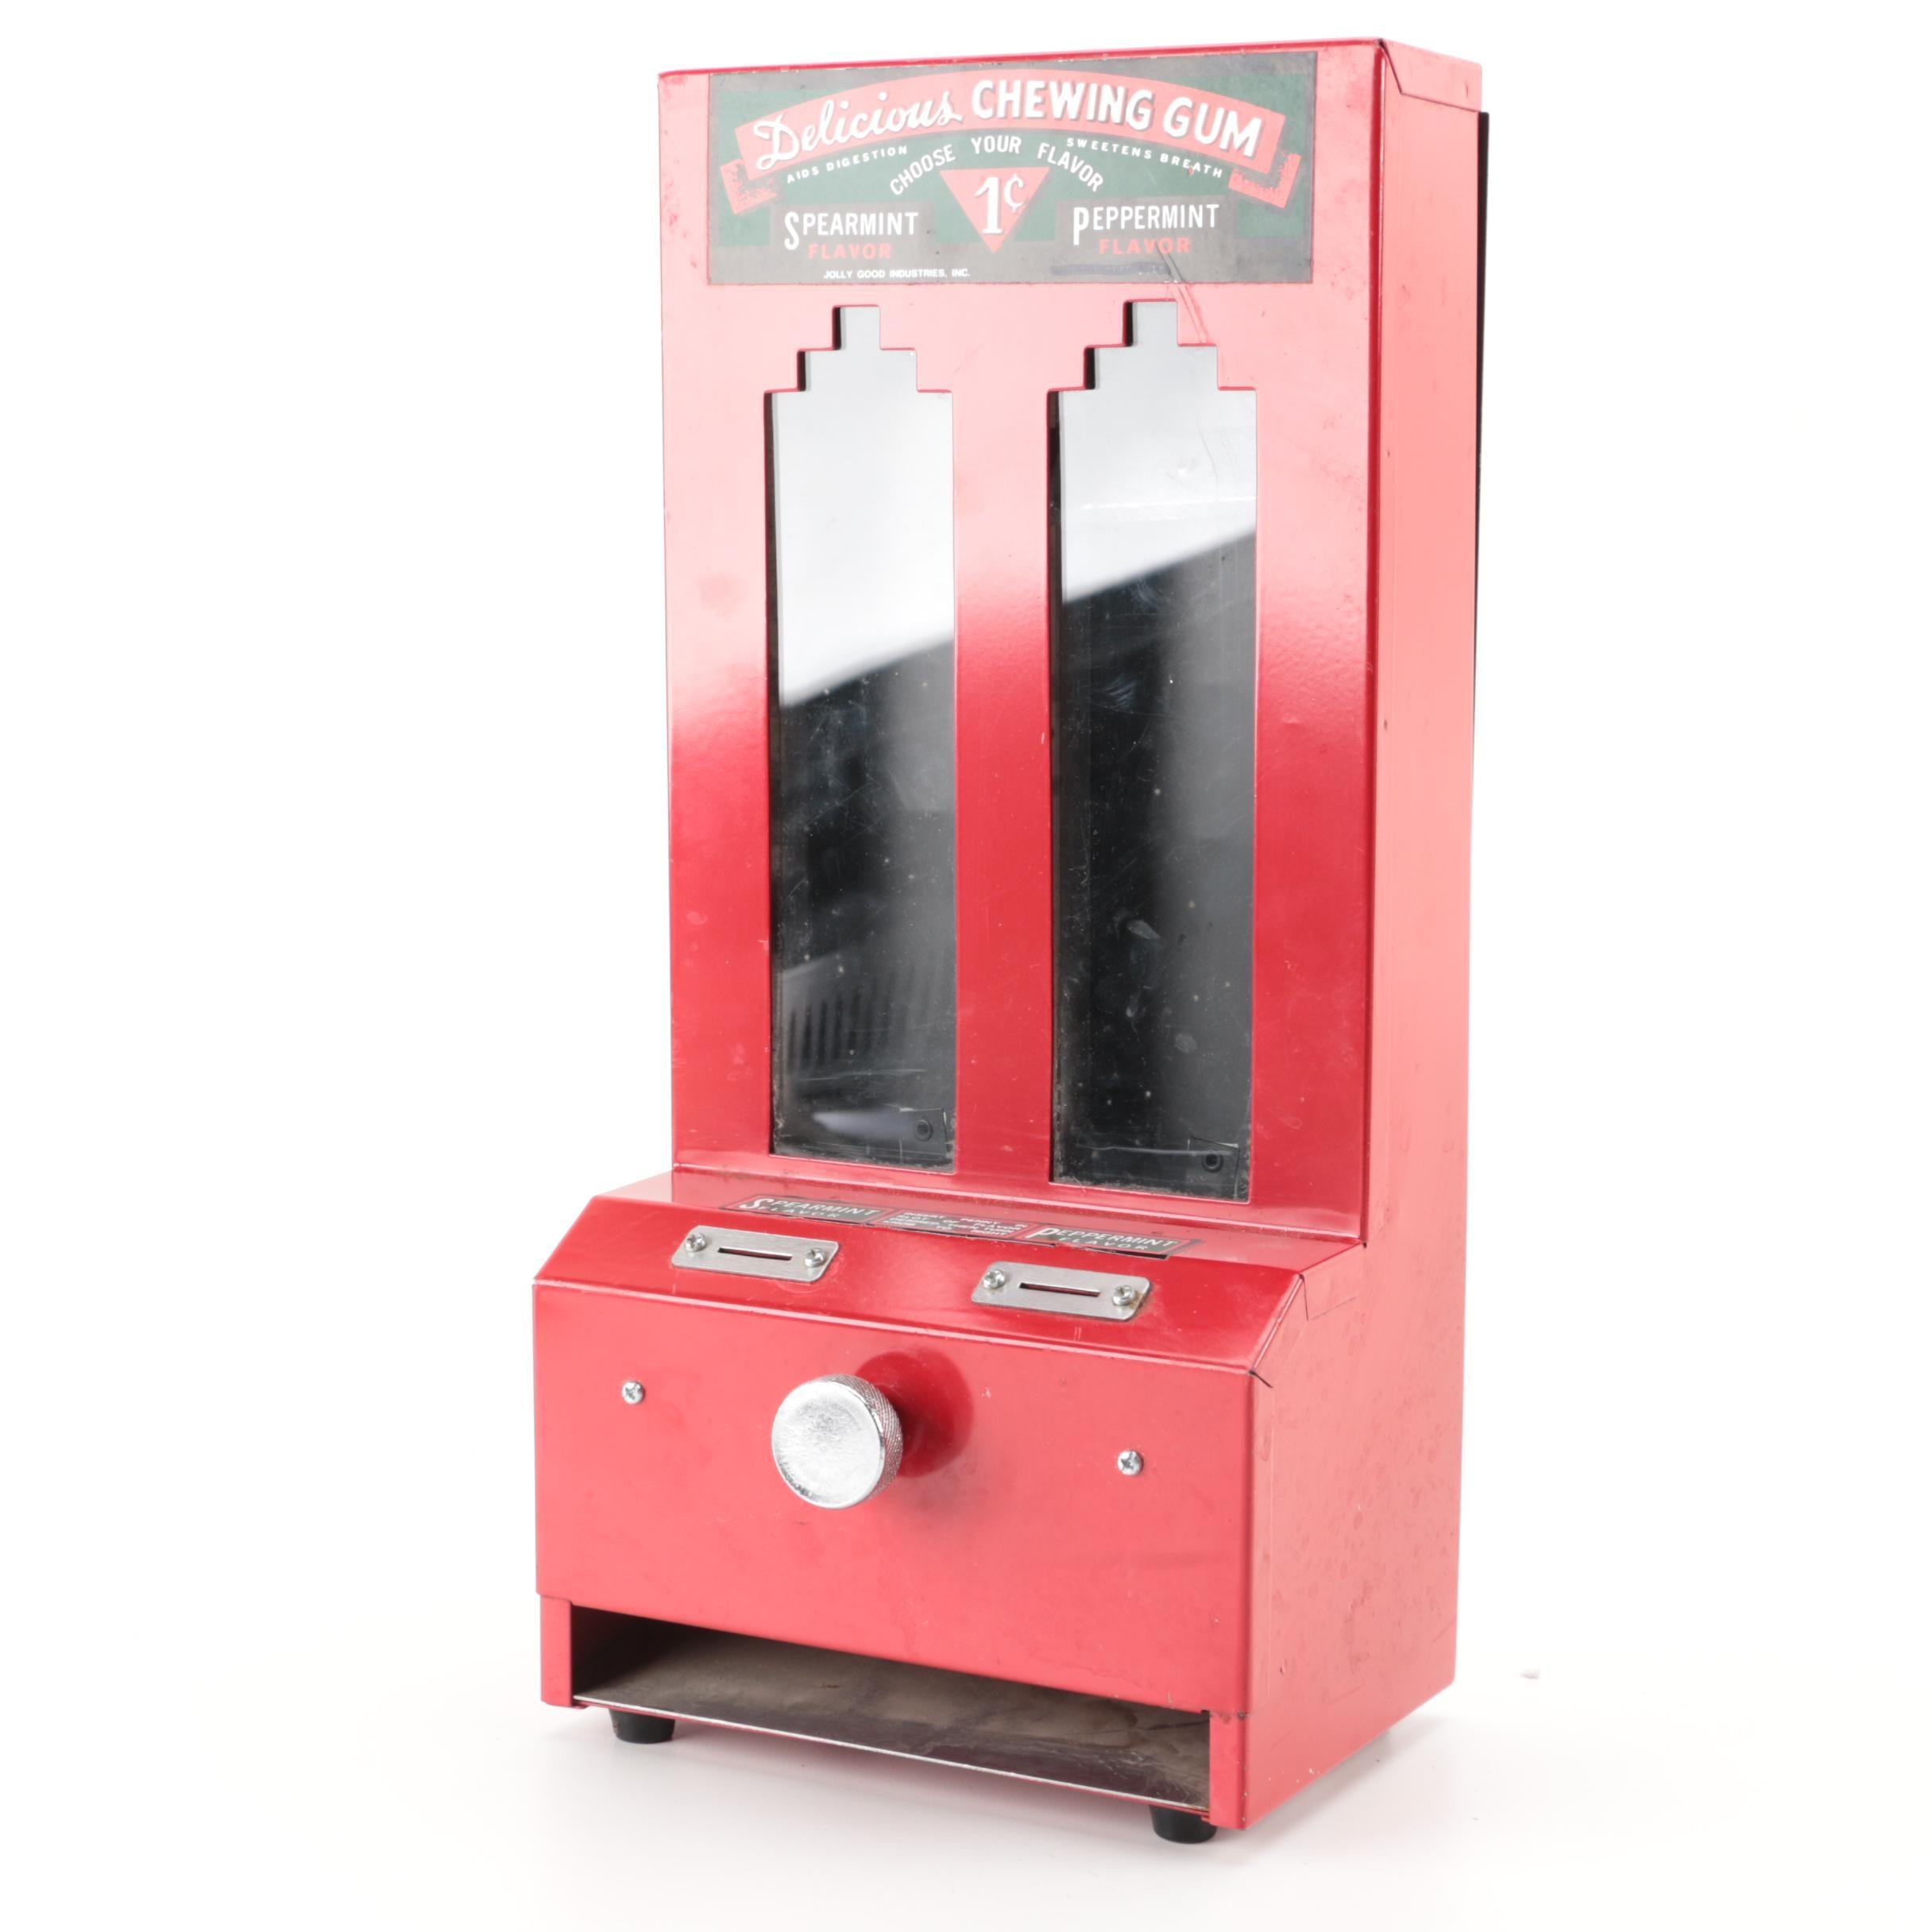 Vintage Metal Miniature Chewing Gum Dispenser